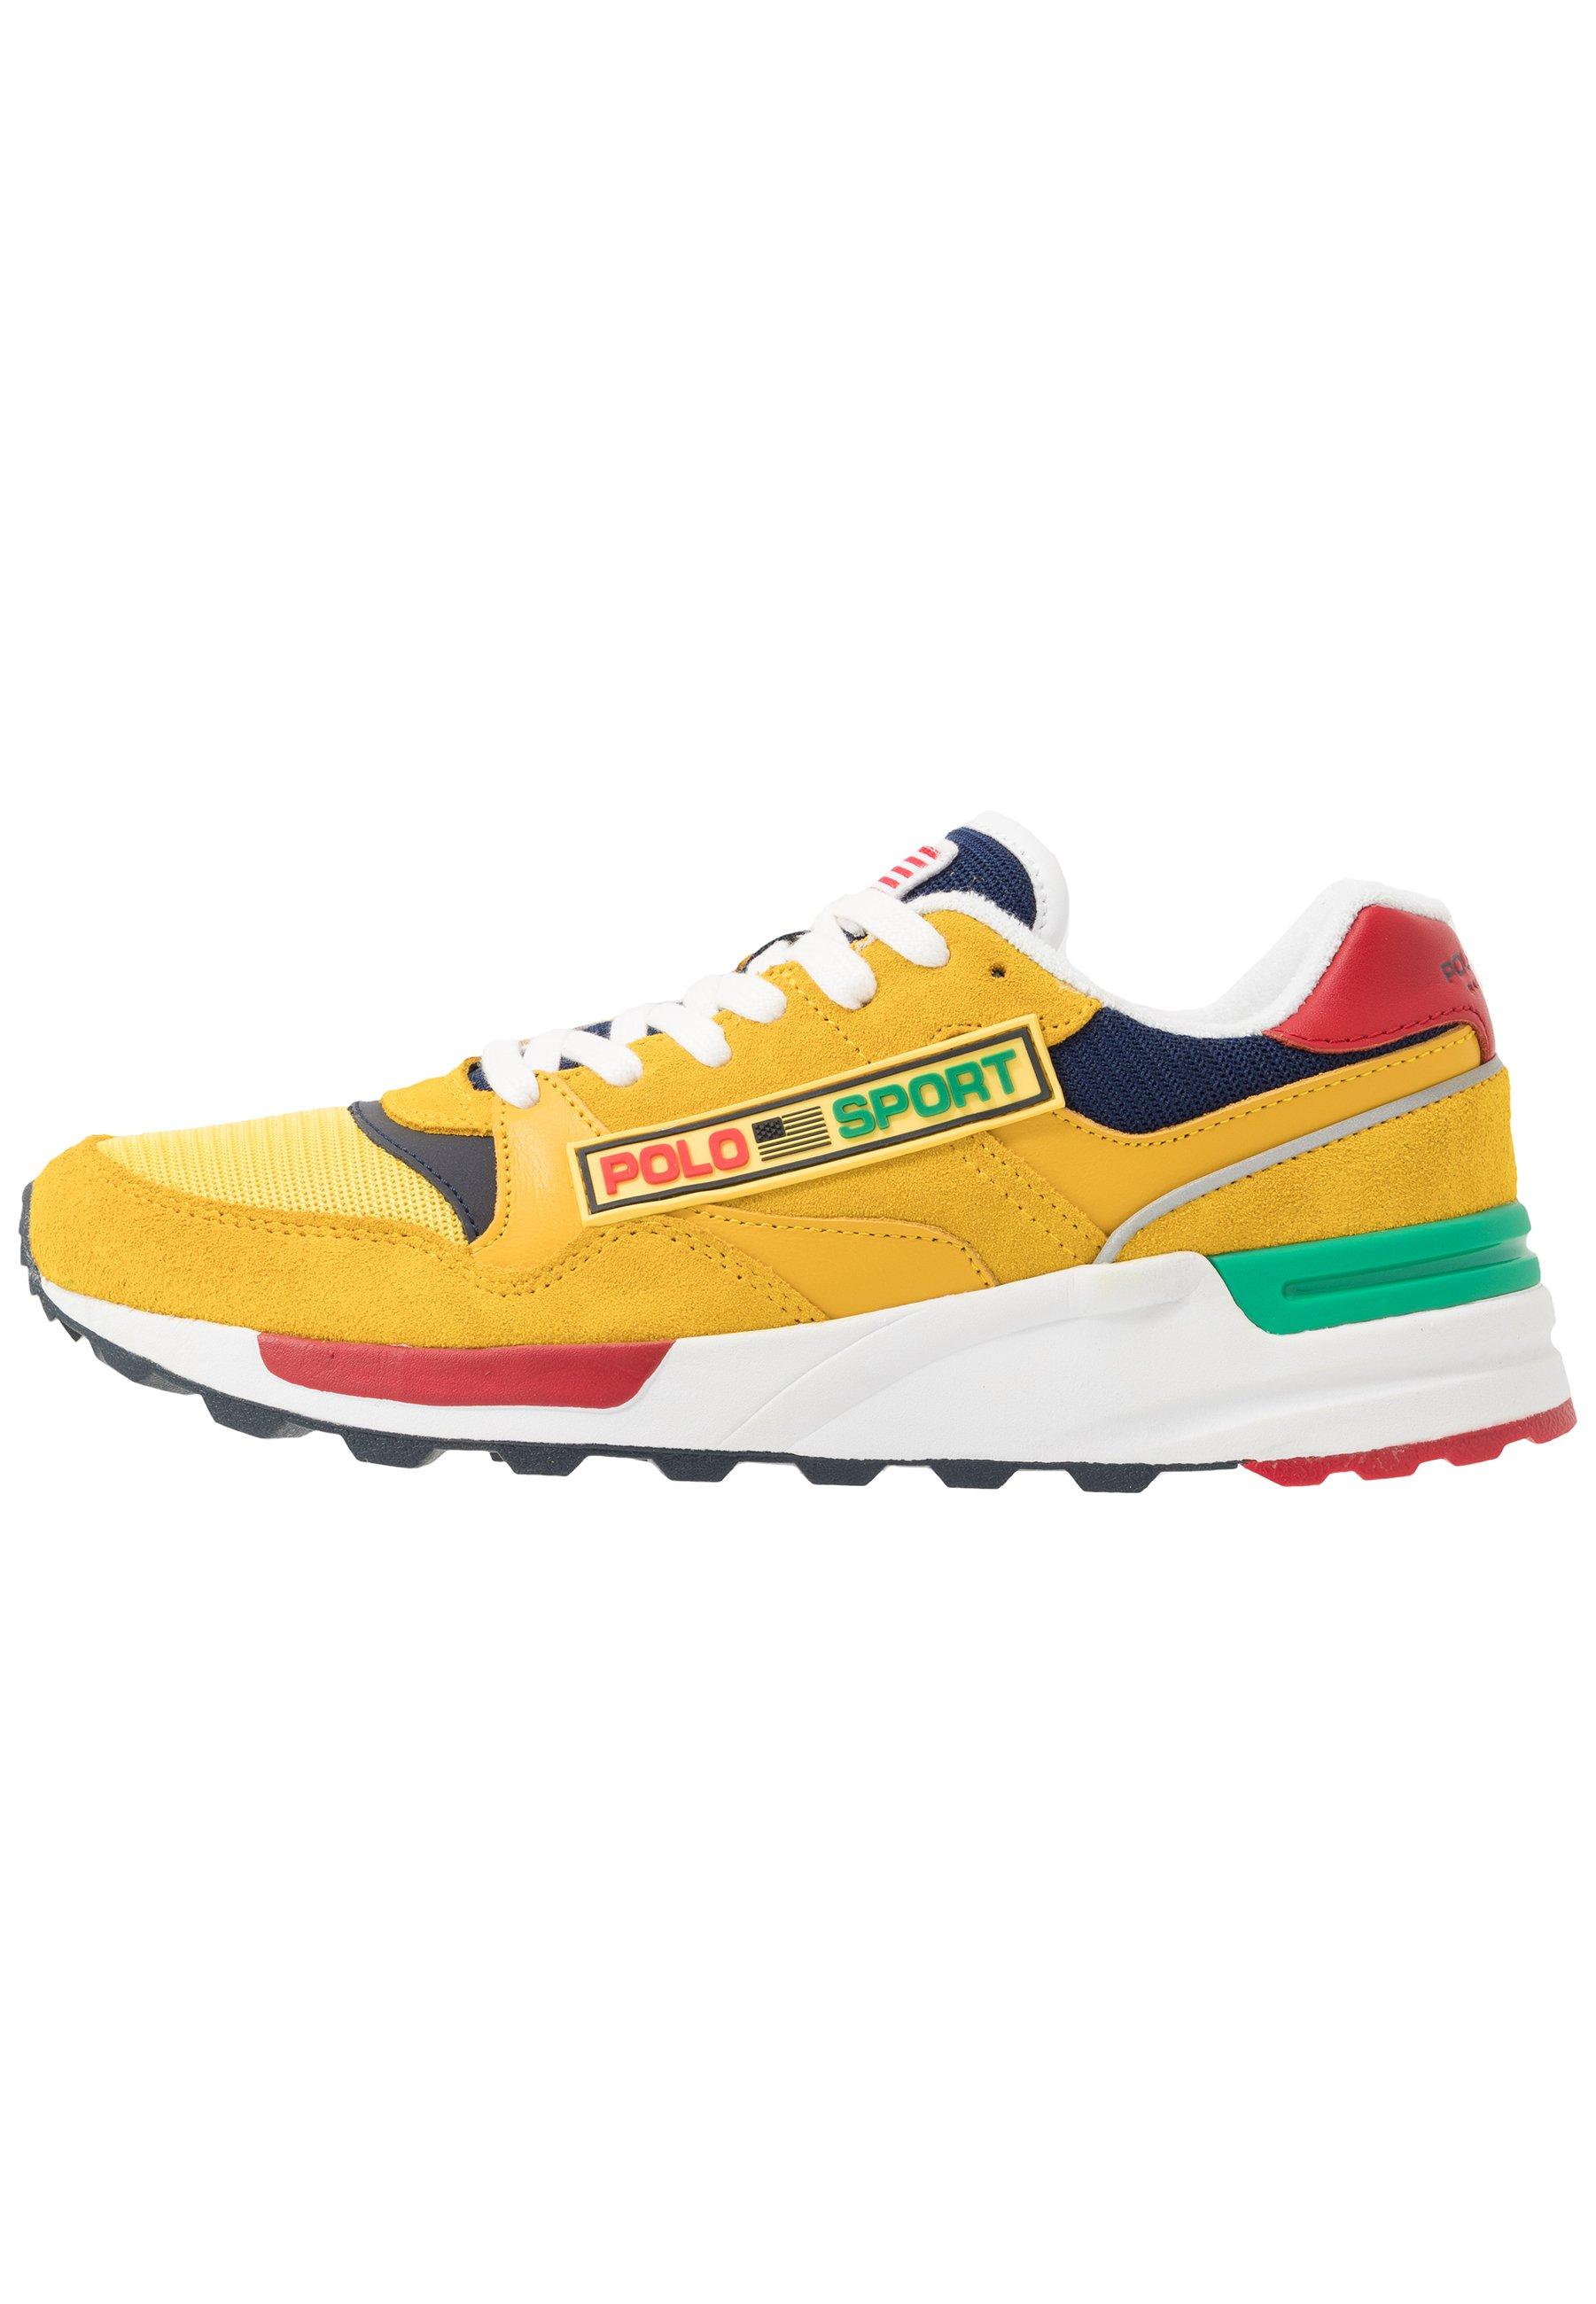 Polo Ralph Lauren Sneaker Low - Chrome Yellow Black Friday